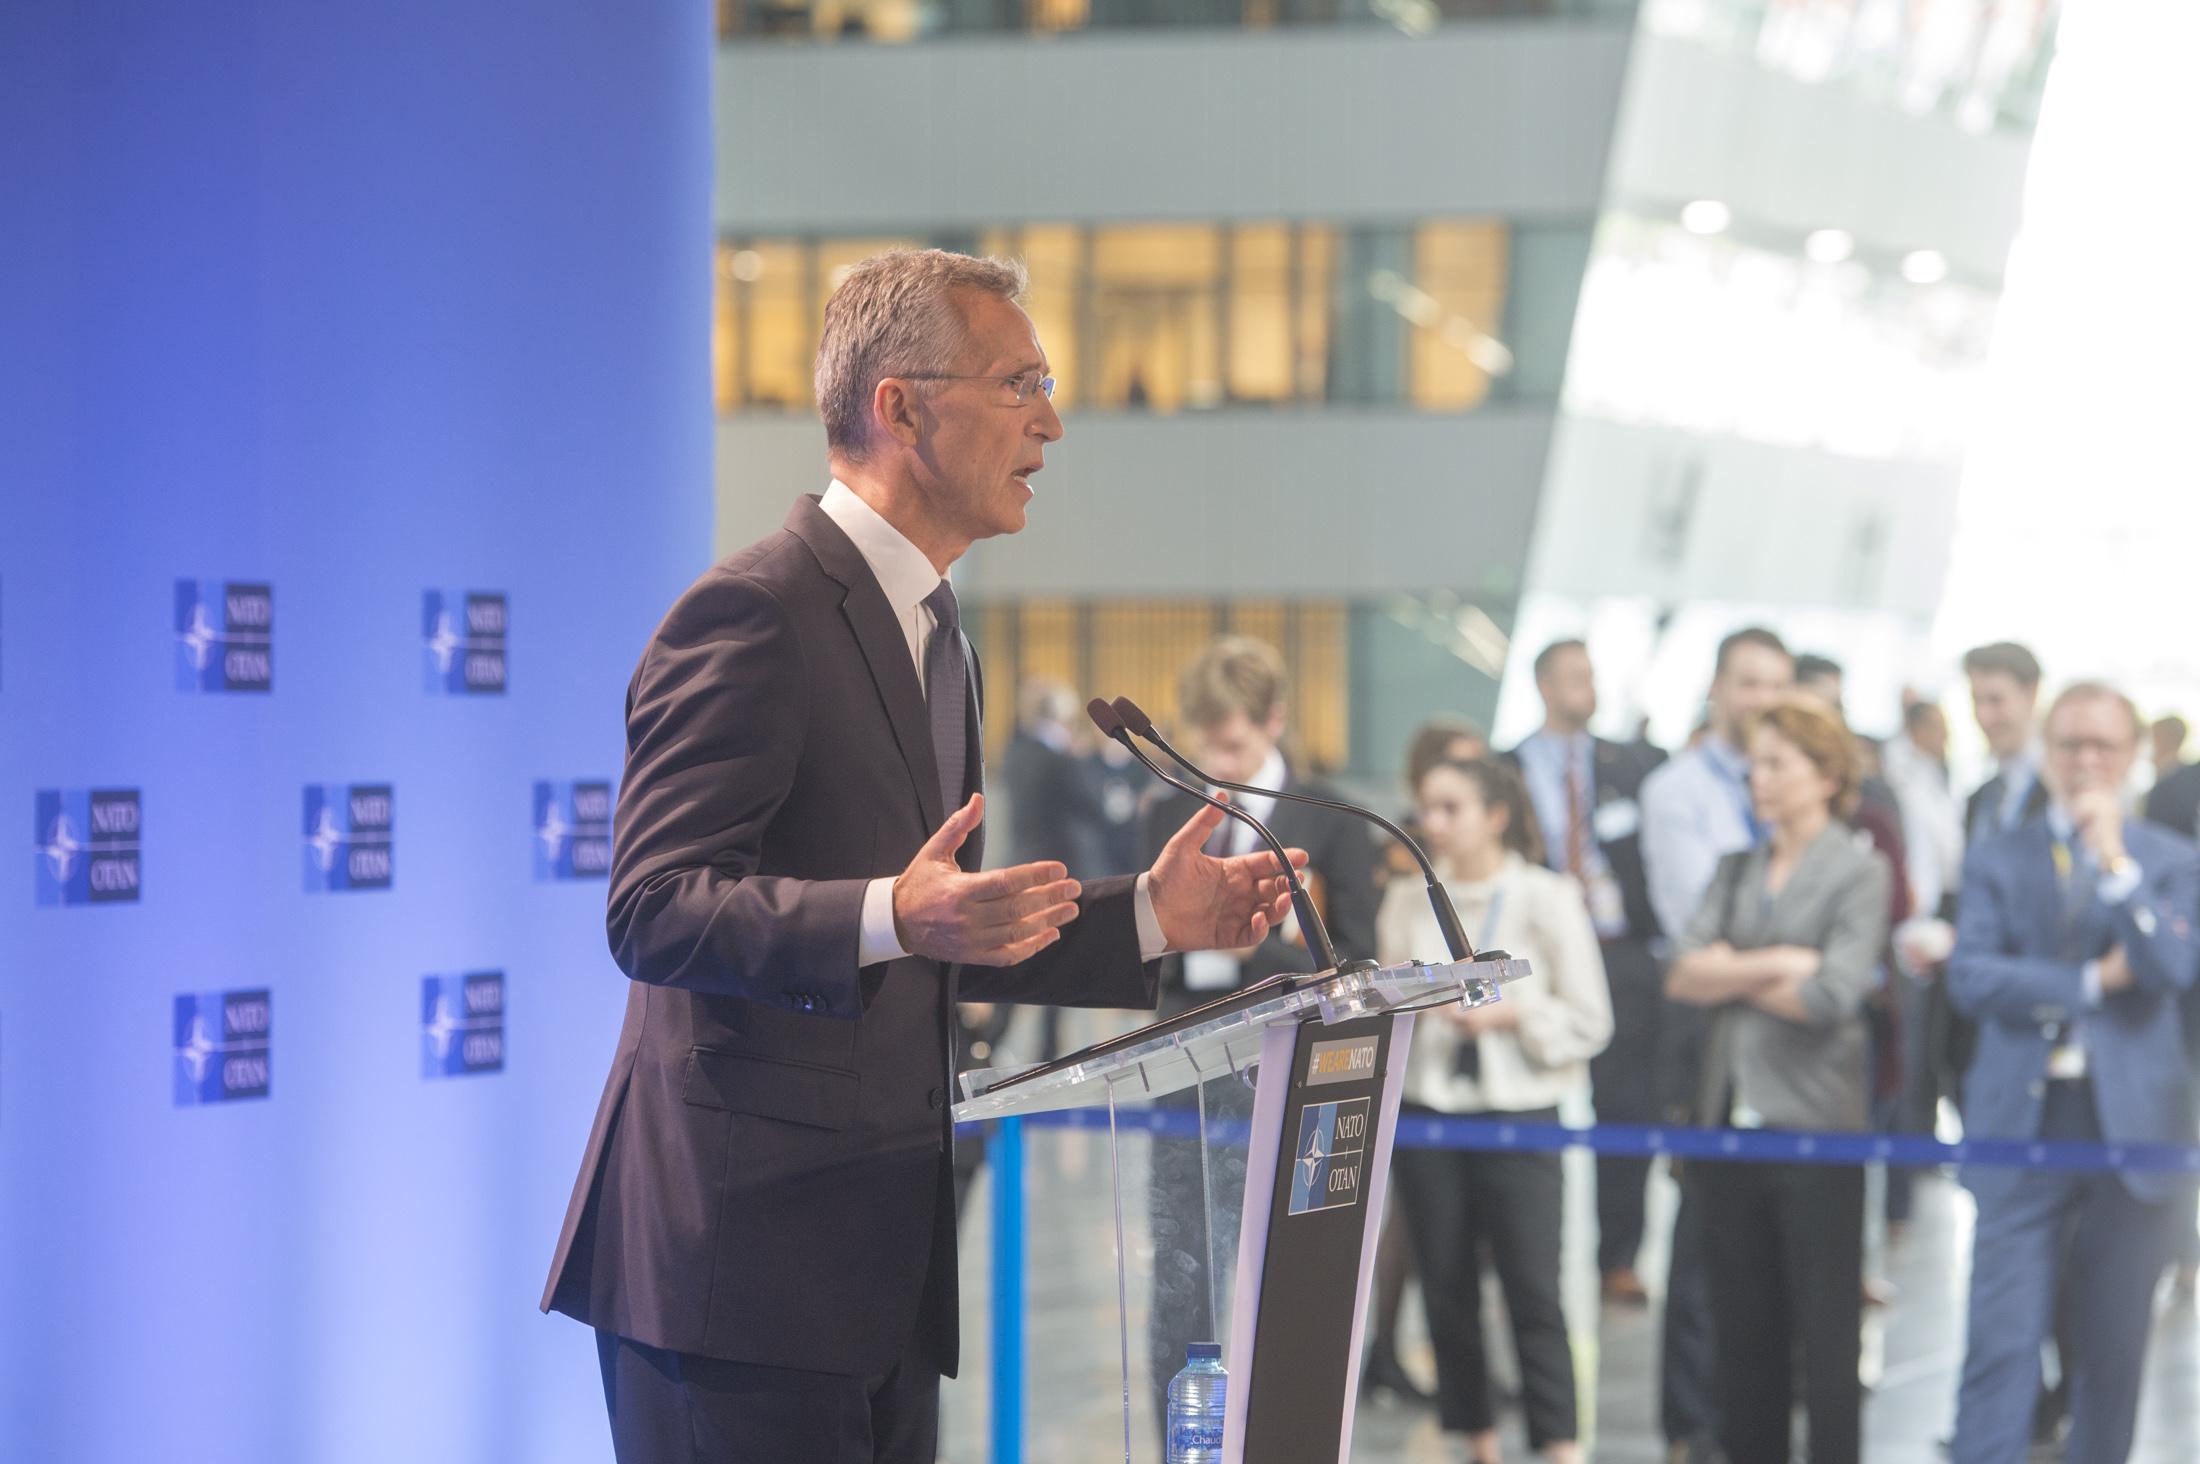 Doorstep statement by NATO Secretary General Jens Stoltenberg